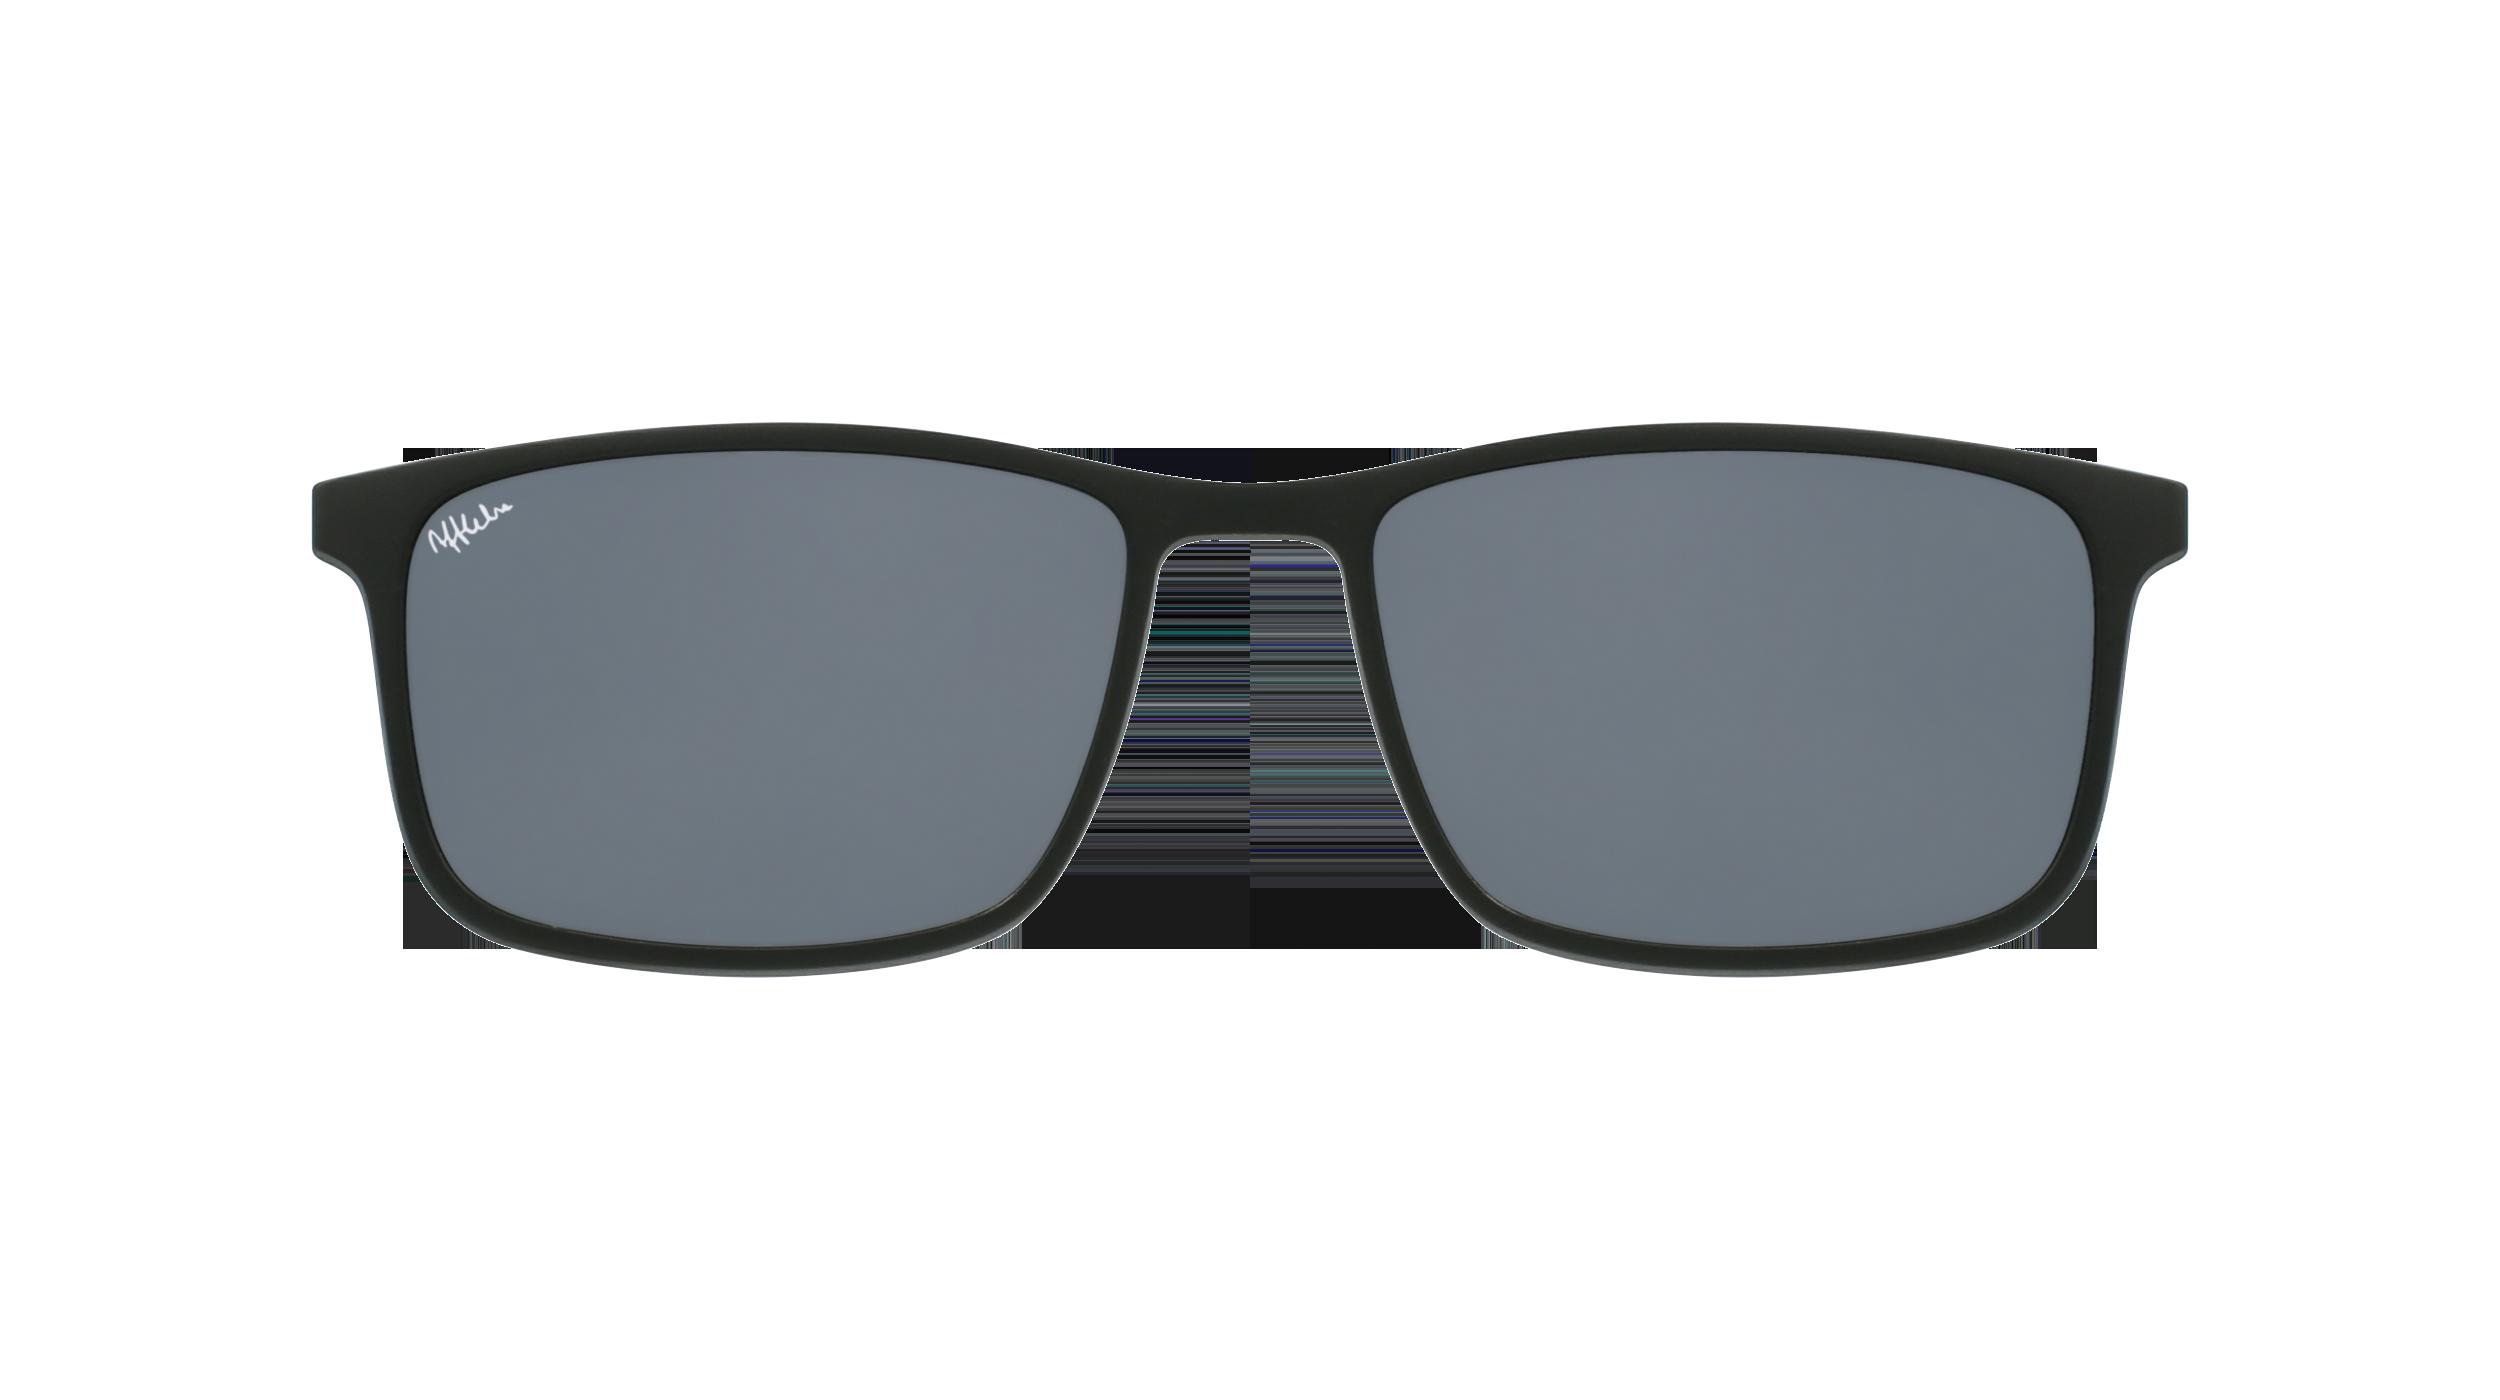 afflelou/france/products/smart_clip/clips_glasses/07630036458679.png